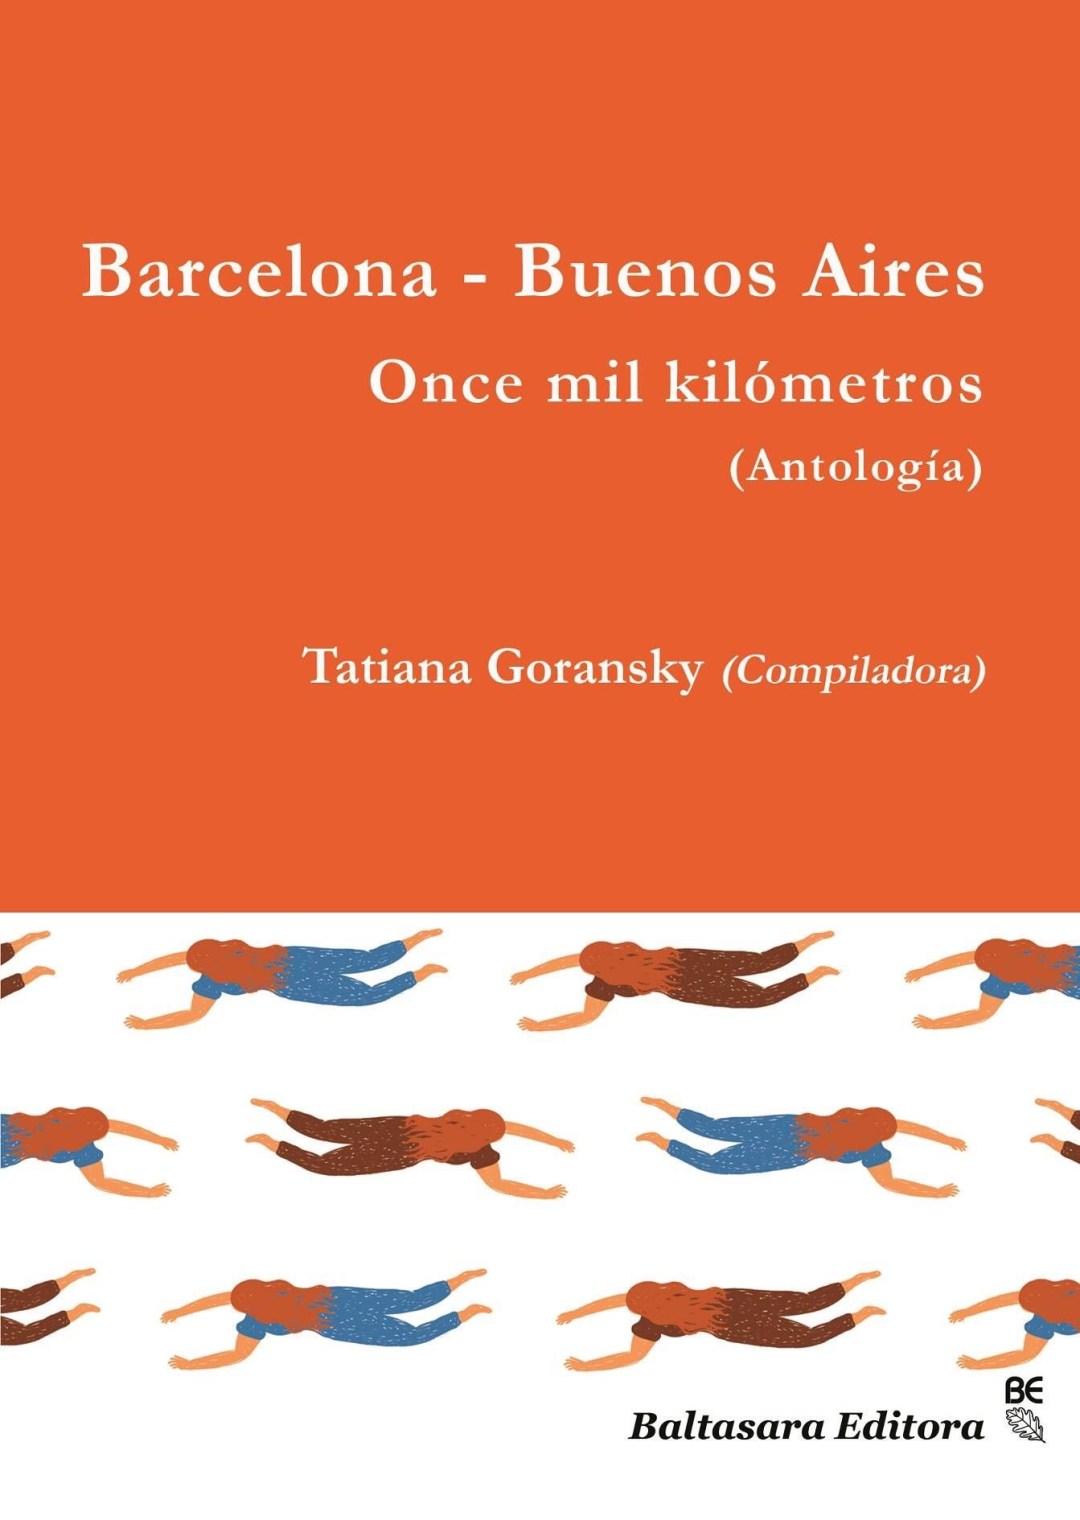 Antologia Barcelona -Buenos Aires once mil kilometros